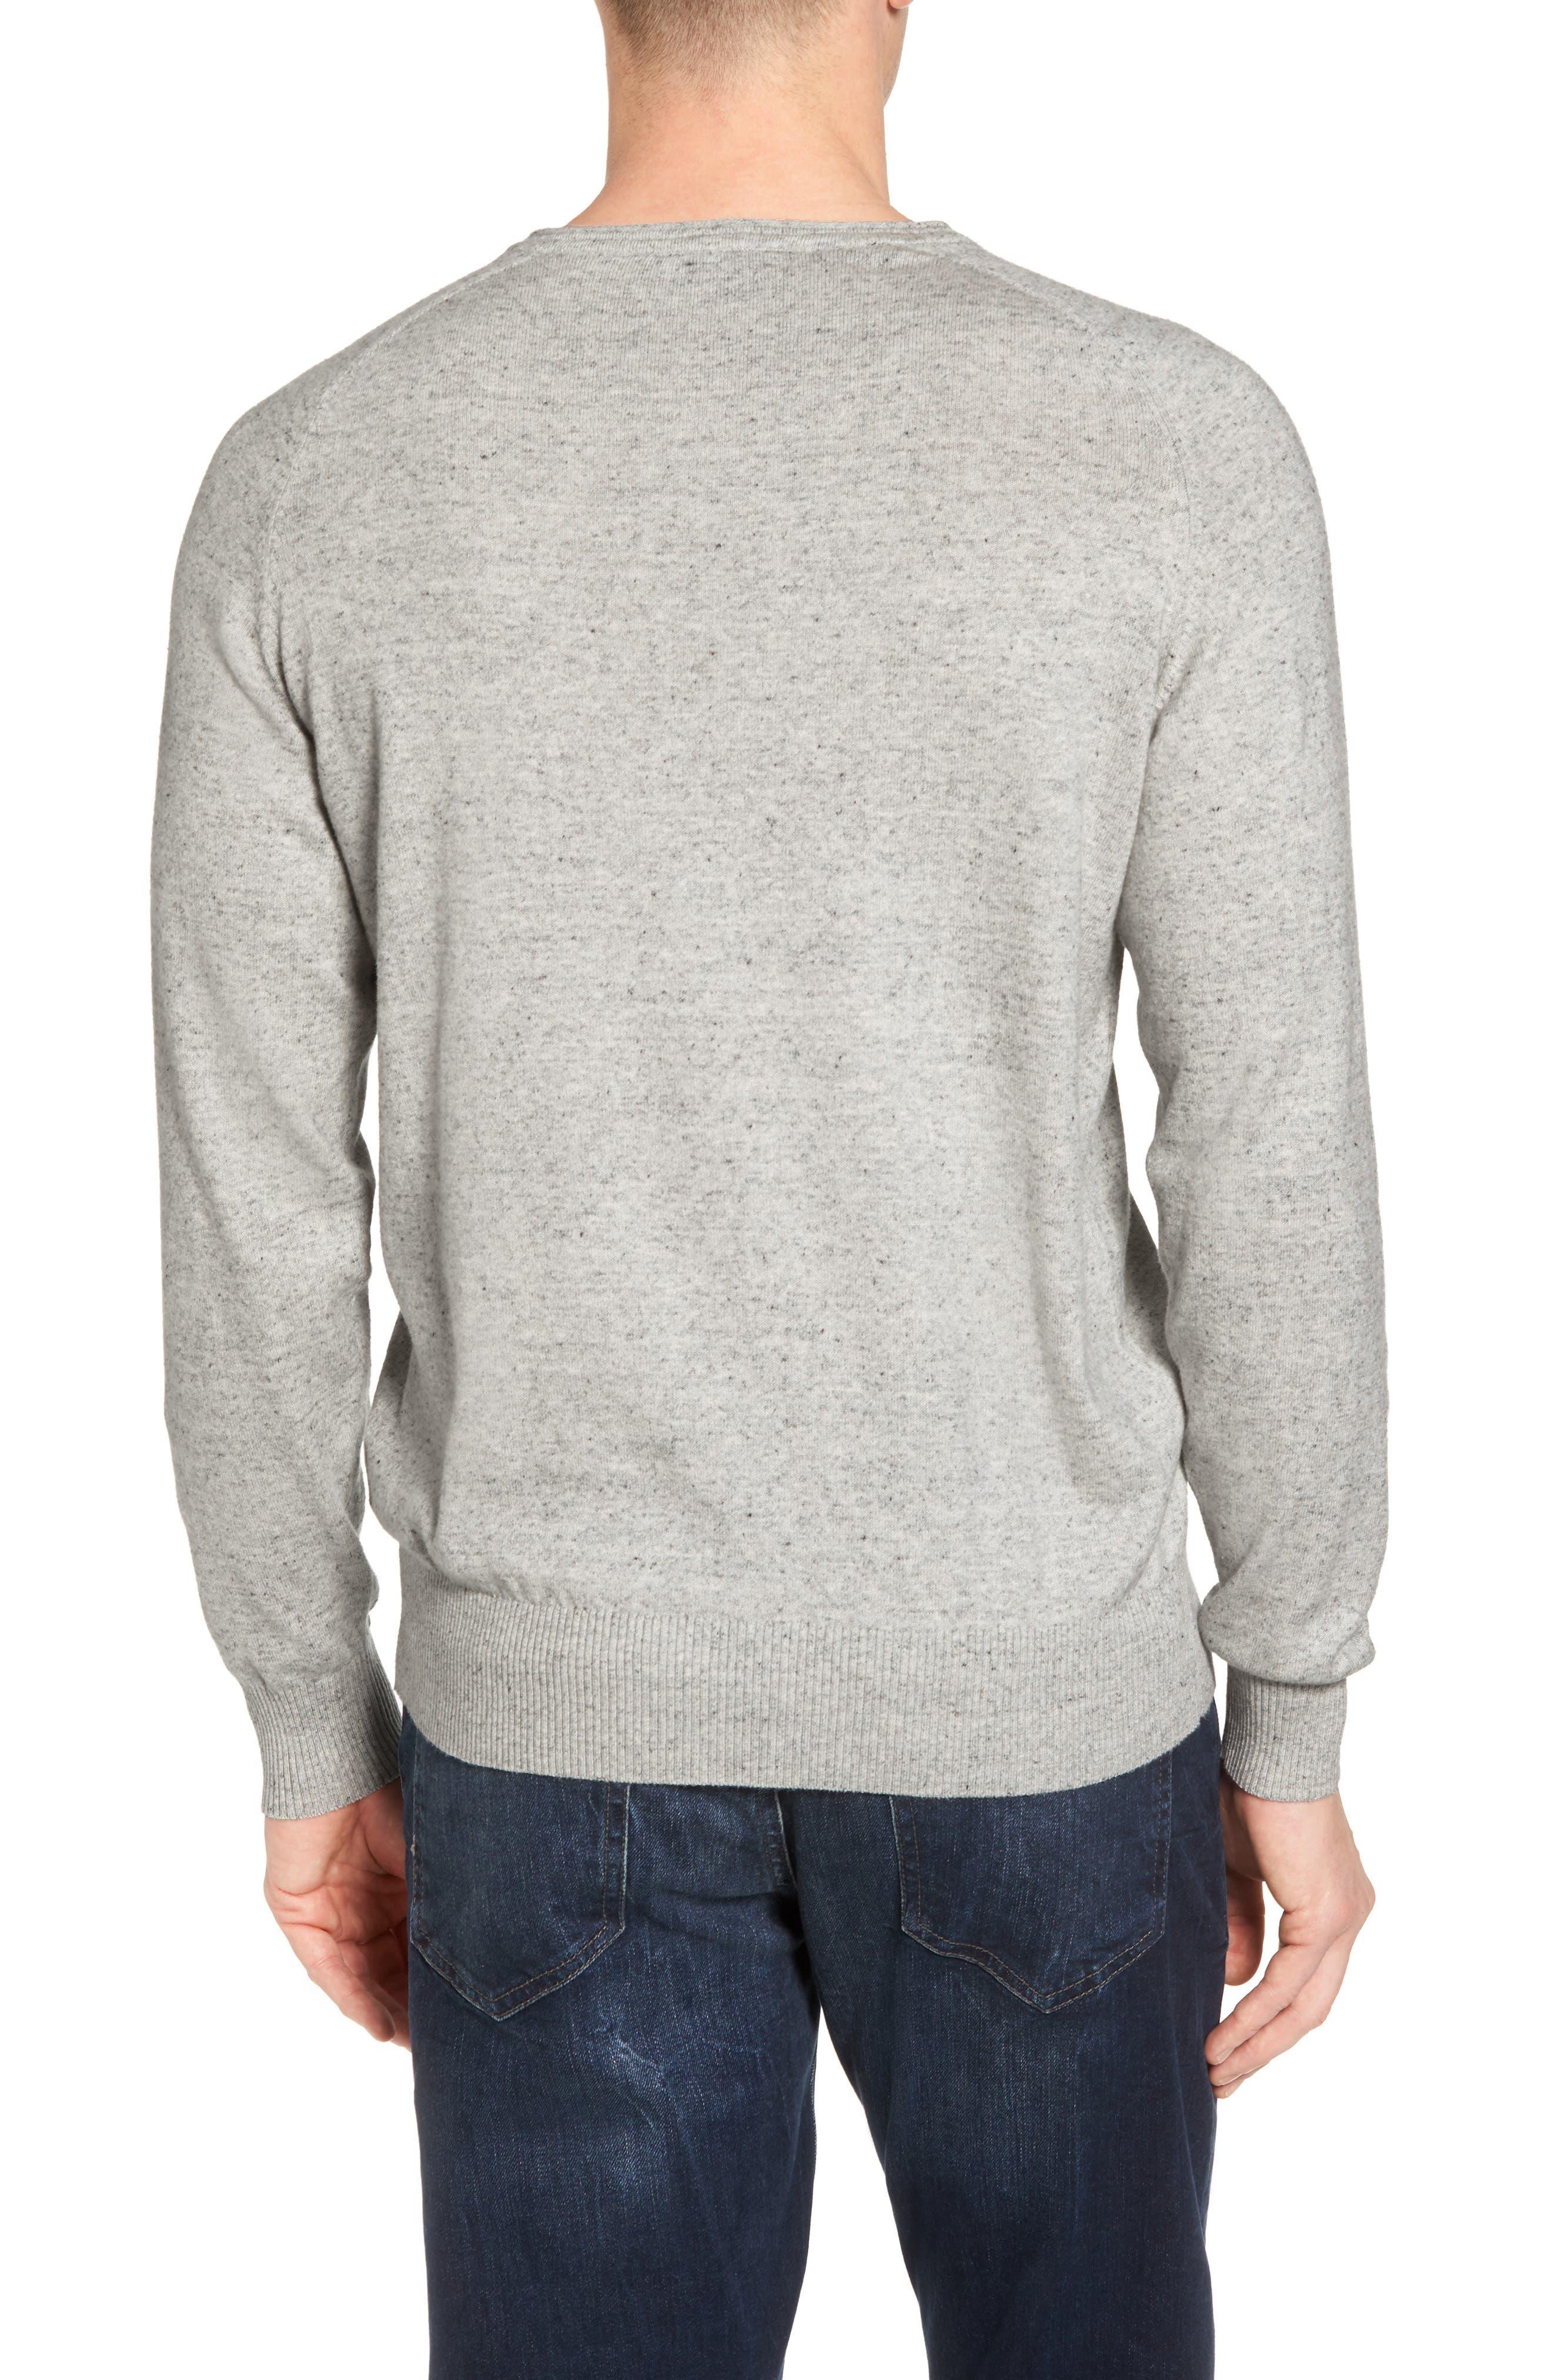 Arbors Cotton V-Neck Sweater,                             Alternate thumbnail 2, color,                             Oatmeal